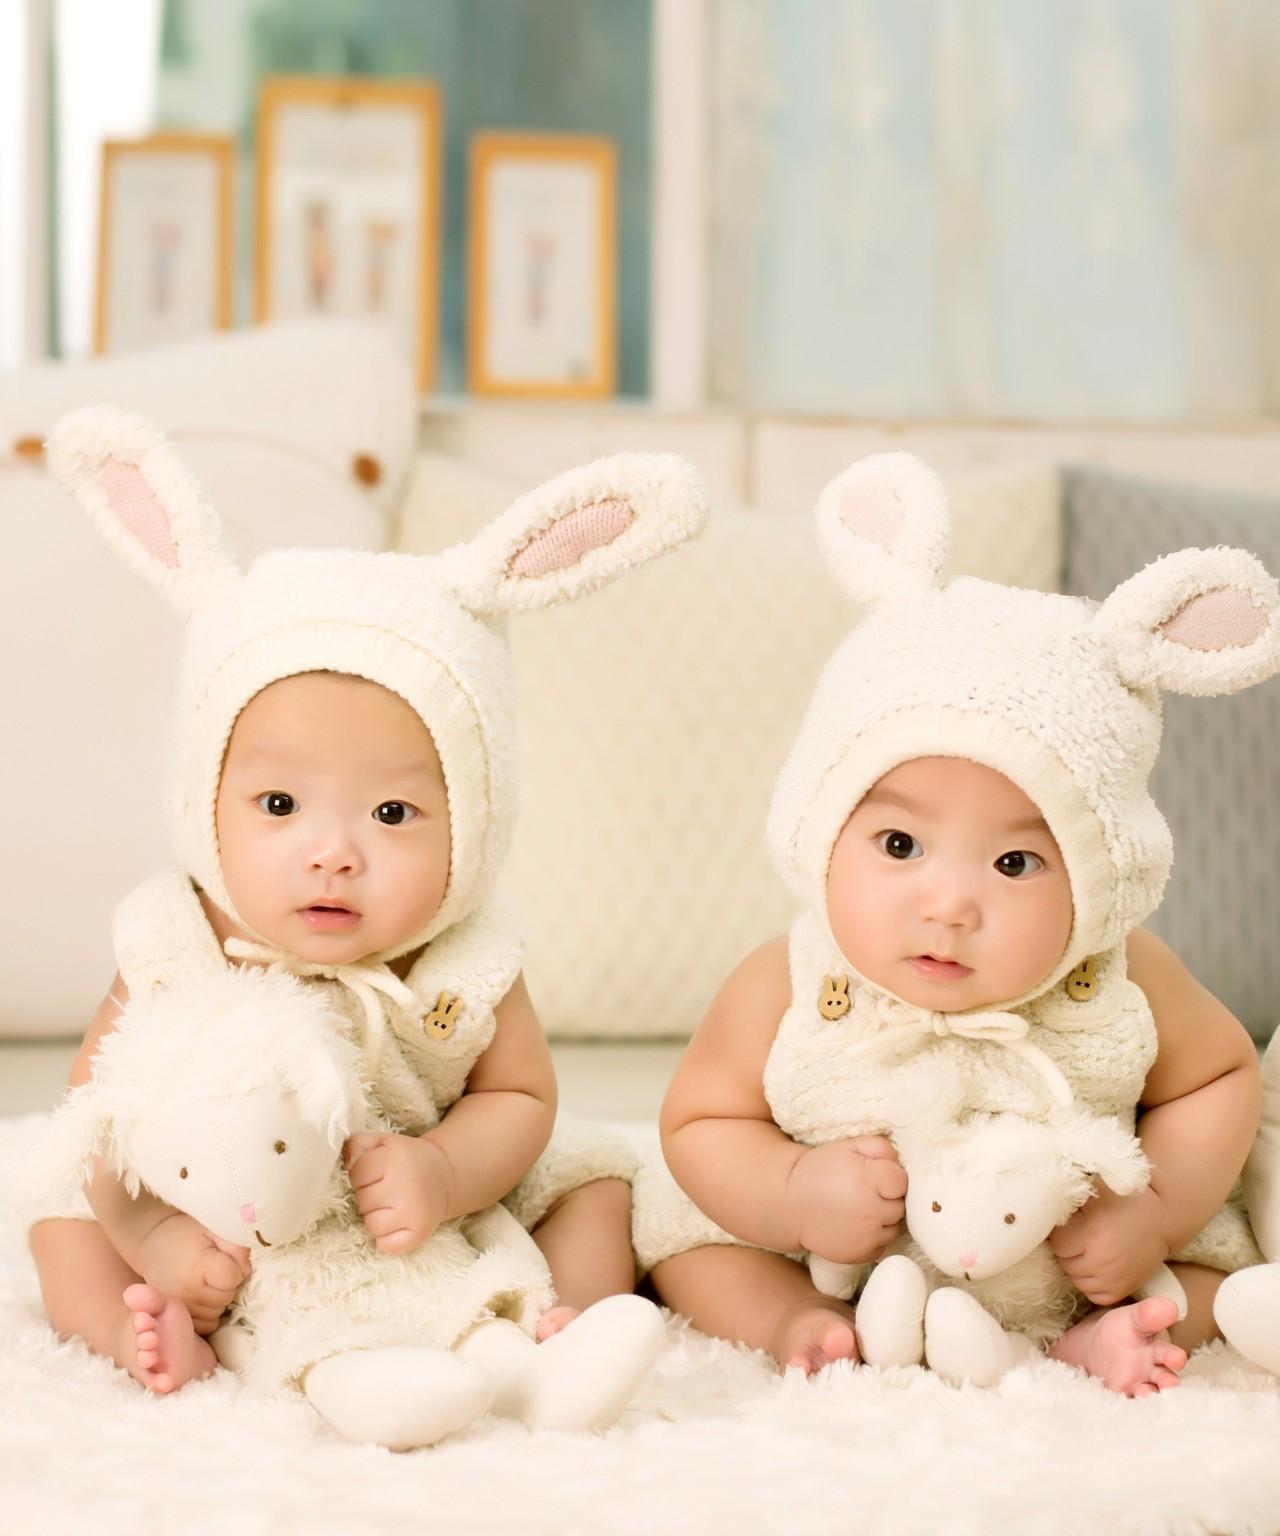 baby-772439.jpg